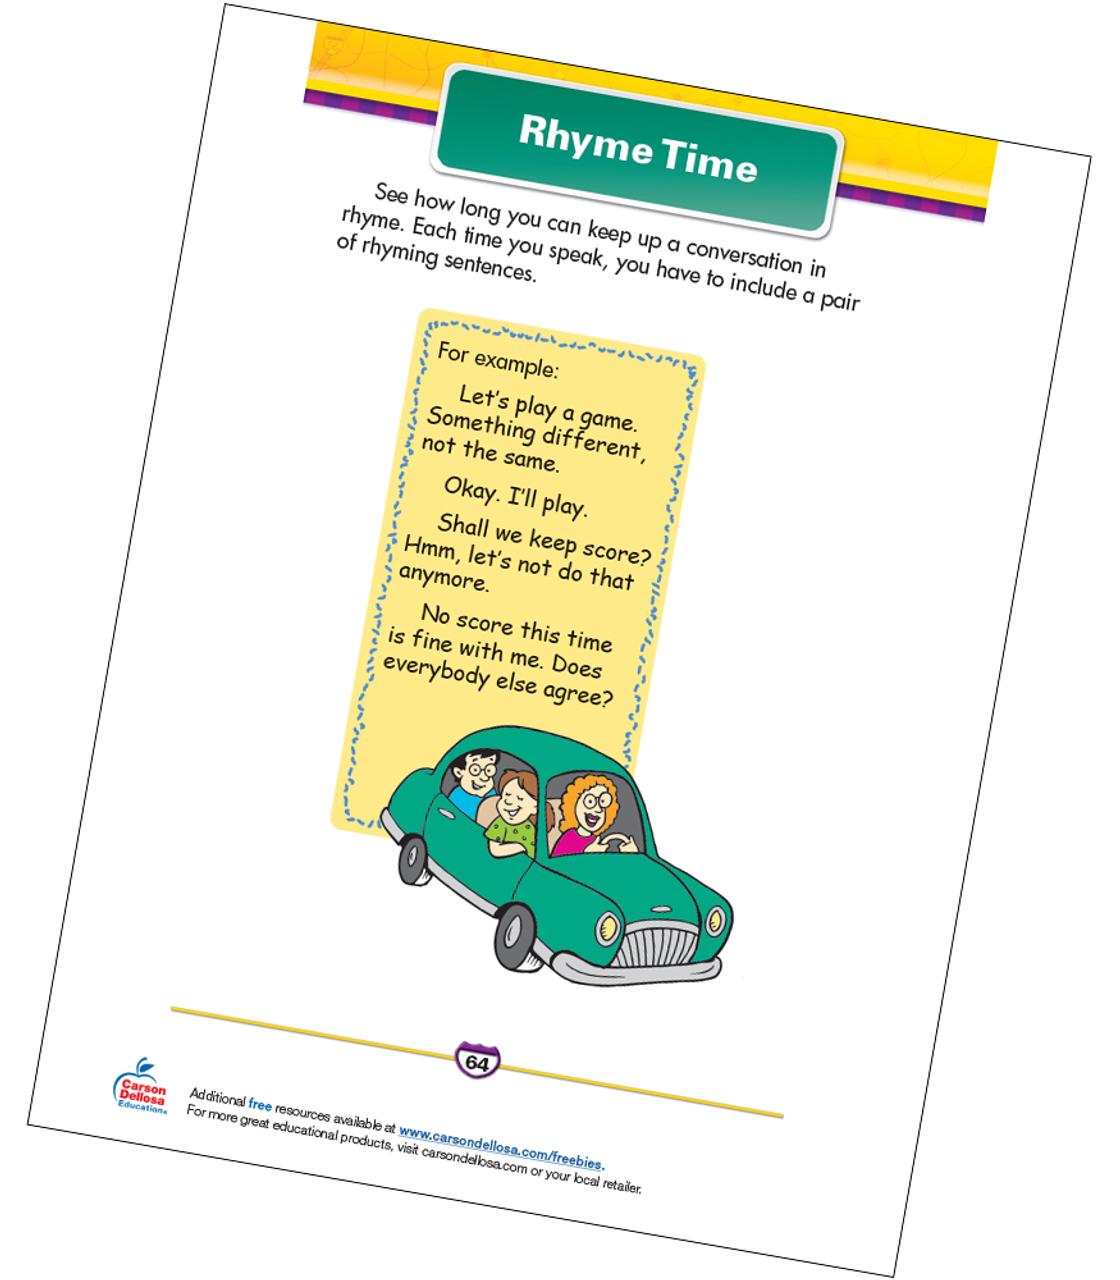 photo relating to Rhyming Game Printable referred to as Rhyme Season Totally free Printable Carson Dellosa